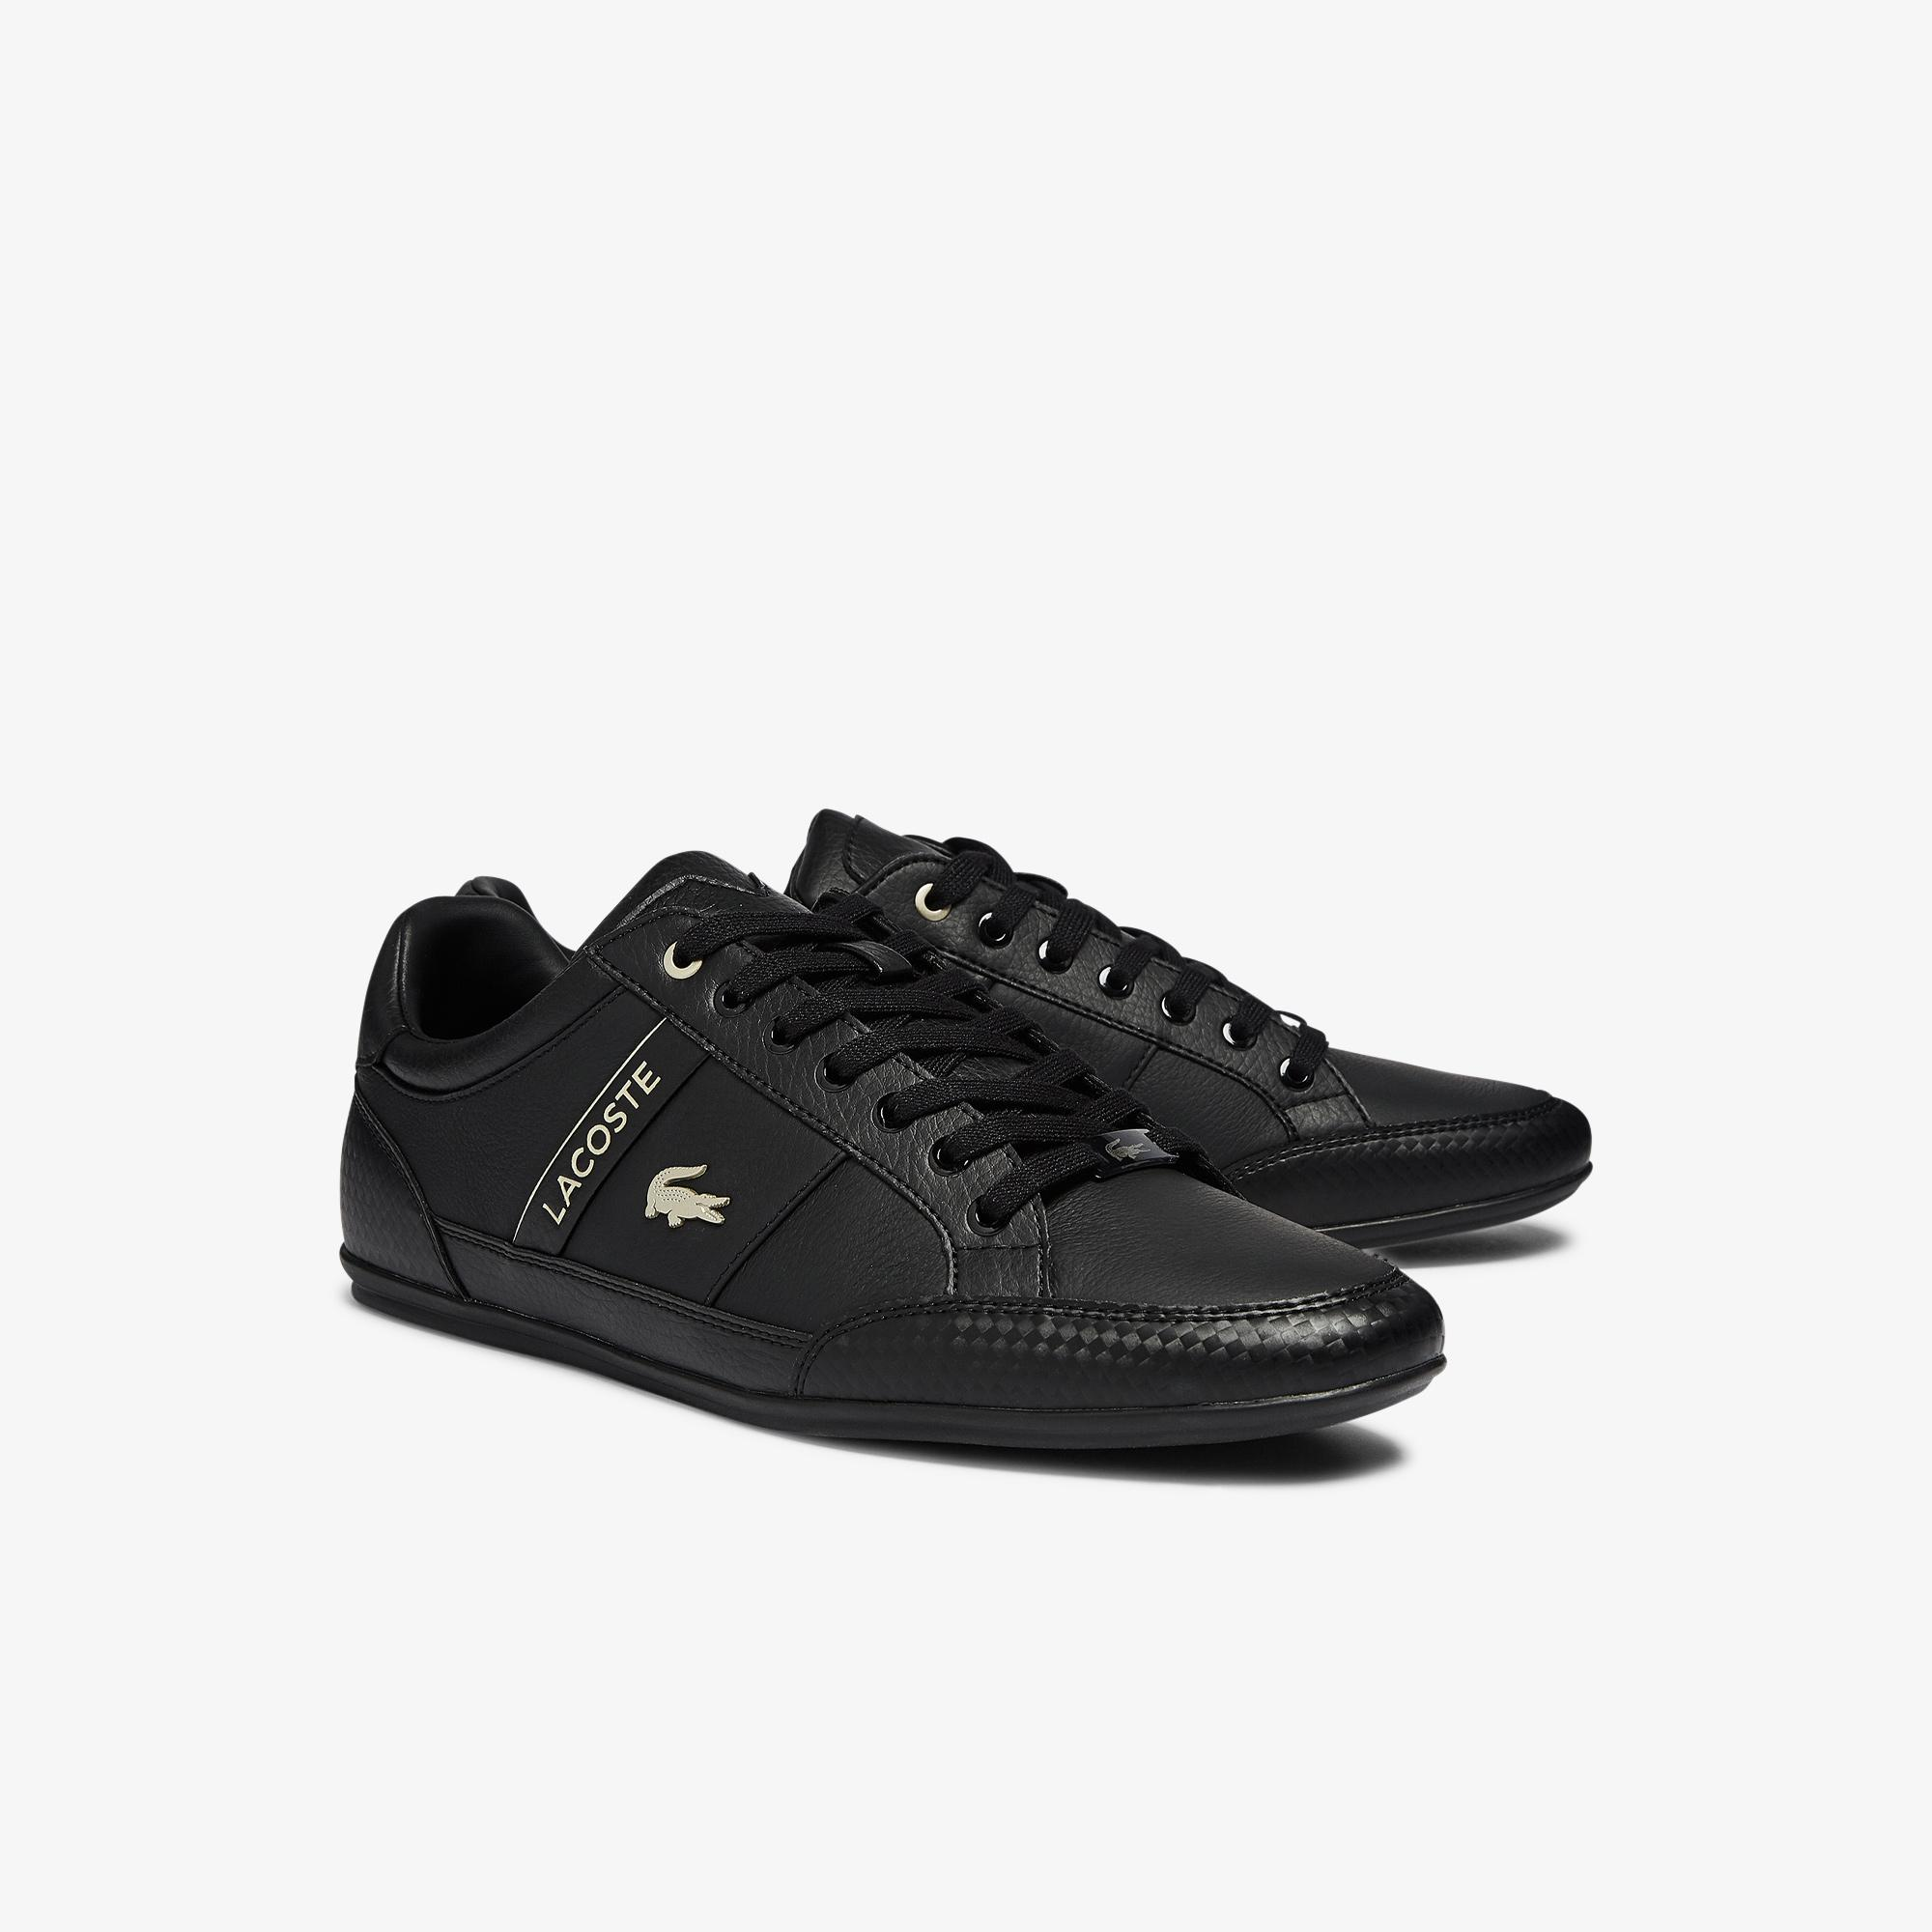 Lacoste Chaymon 0721 3 Cma Erkek Deri Siyah Sneaker